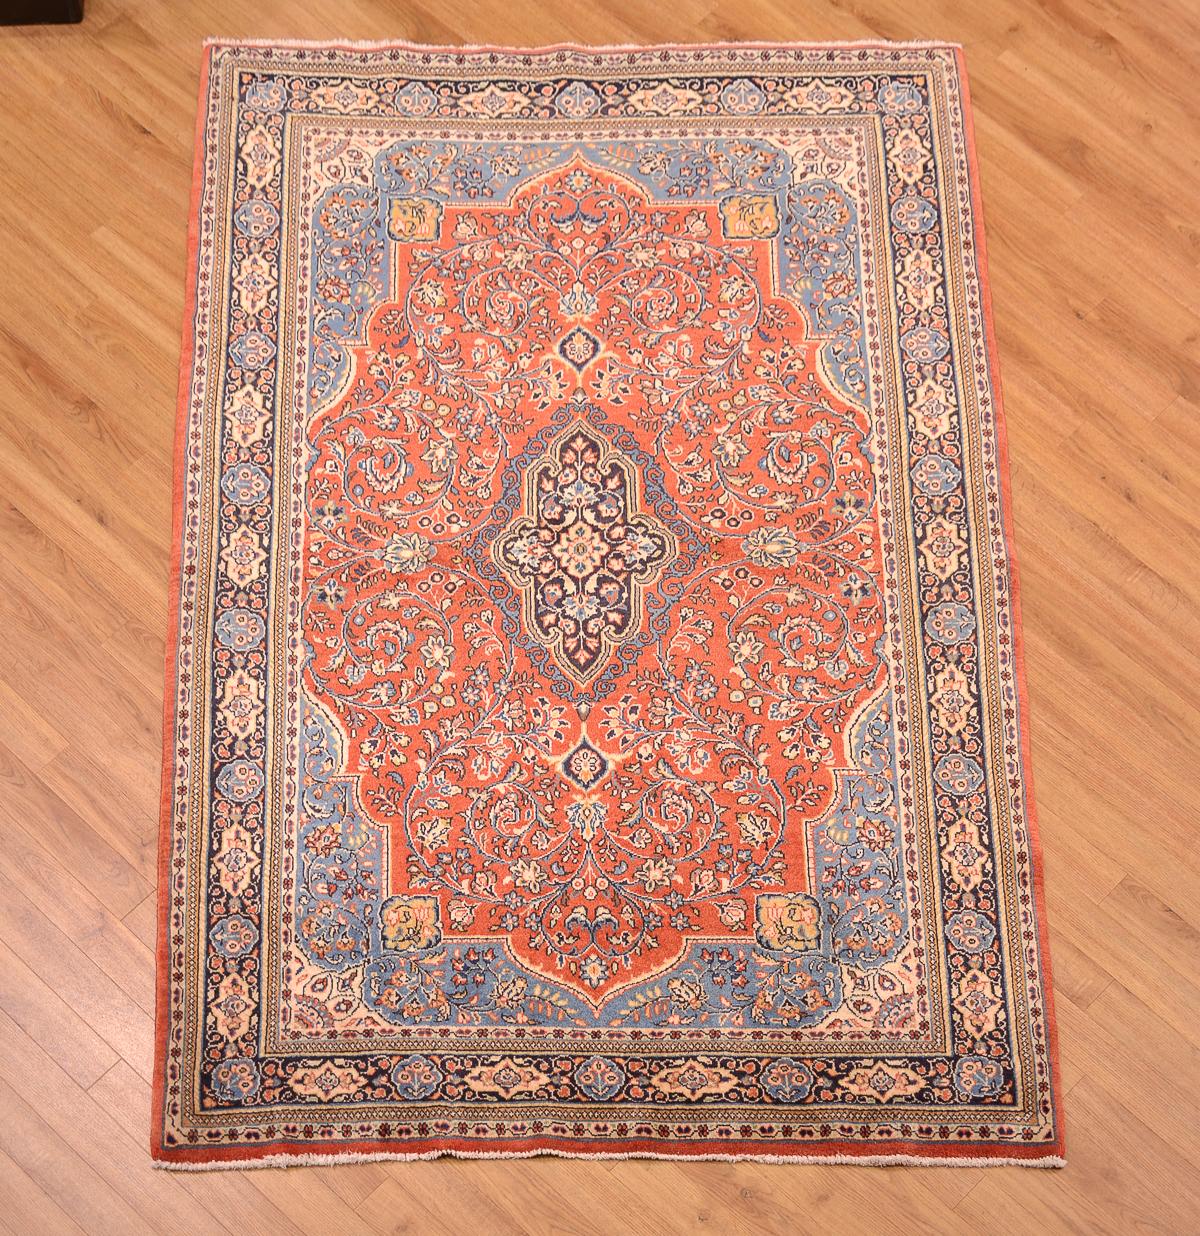 Home & Garden Persian Sarouk 7 X 10 Wool Handmade Floral Medallion Oriental Area Rug Navy Blue